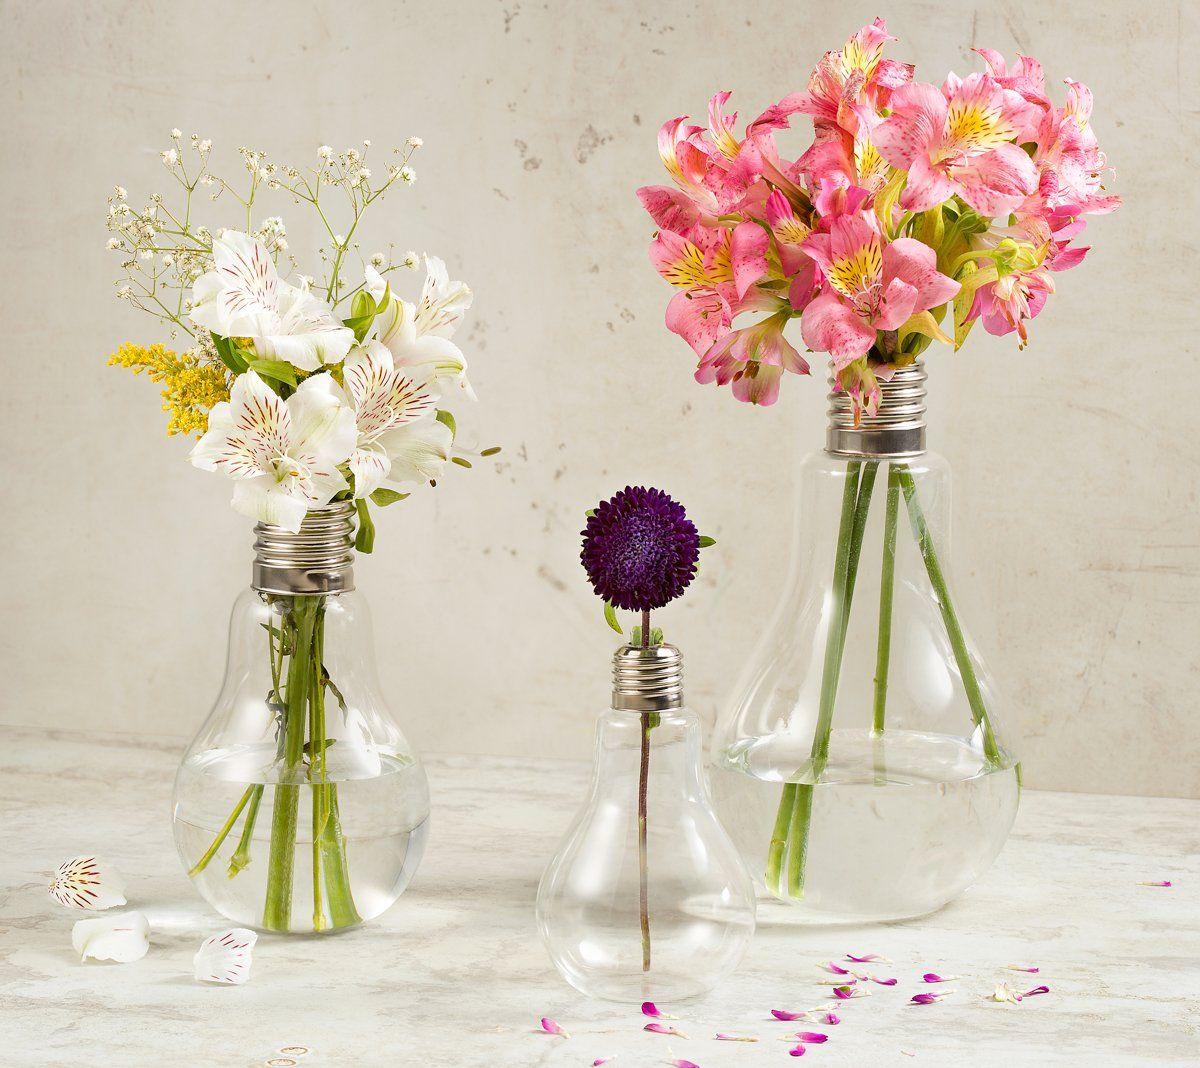 Vaso decorativo 22 cm de vidro transparente e metal Lâmpada Lyor - L3571